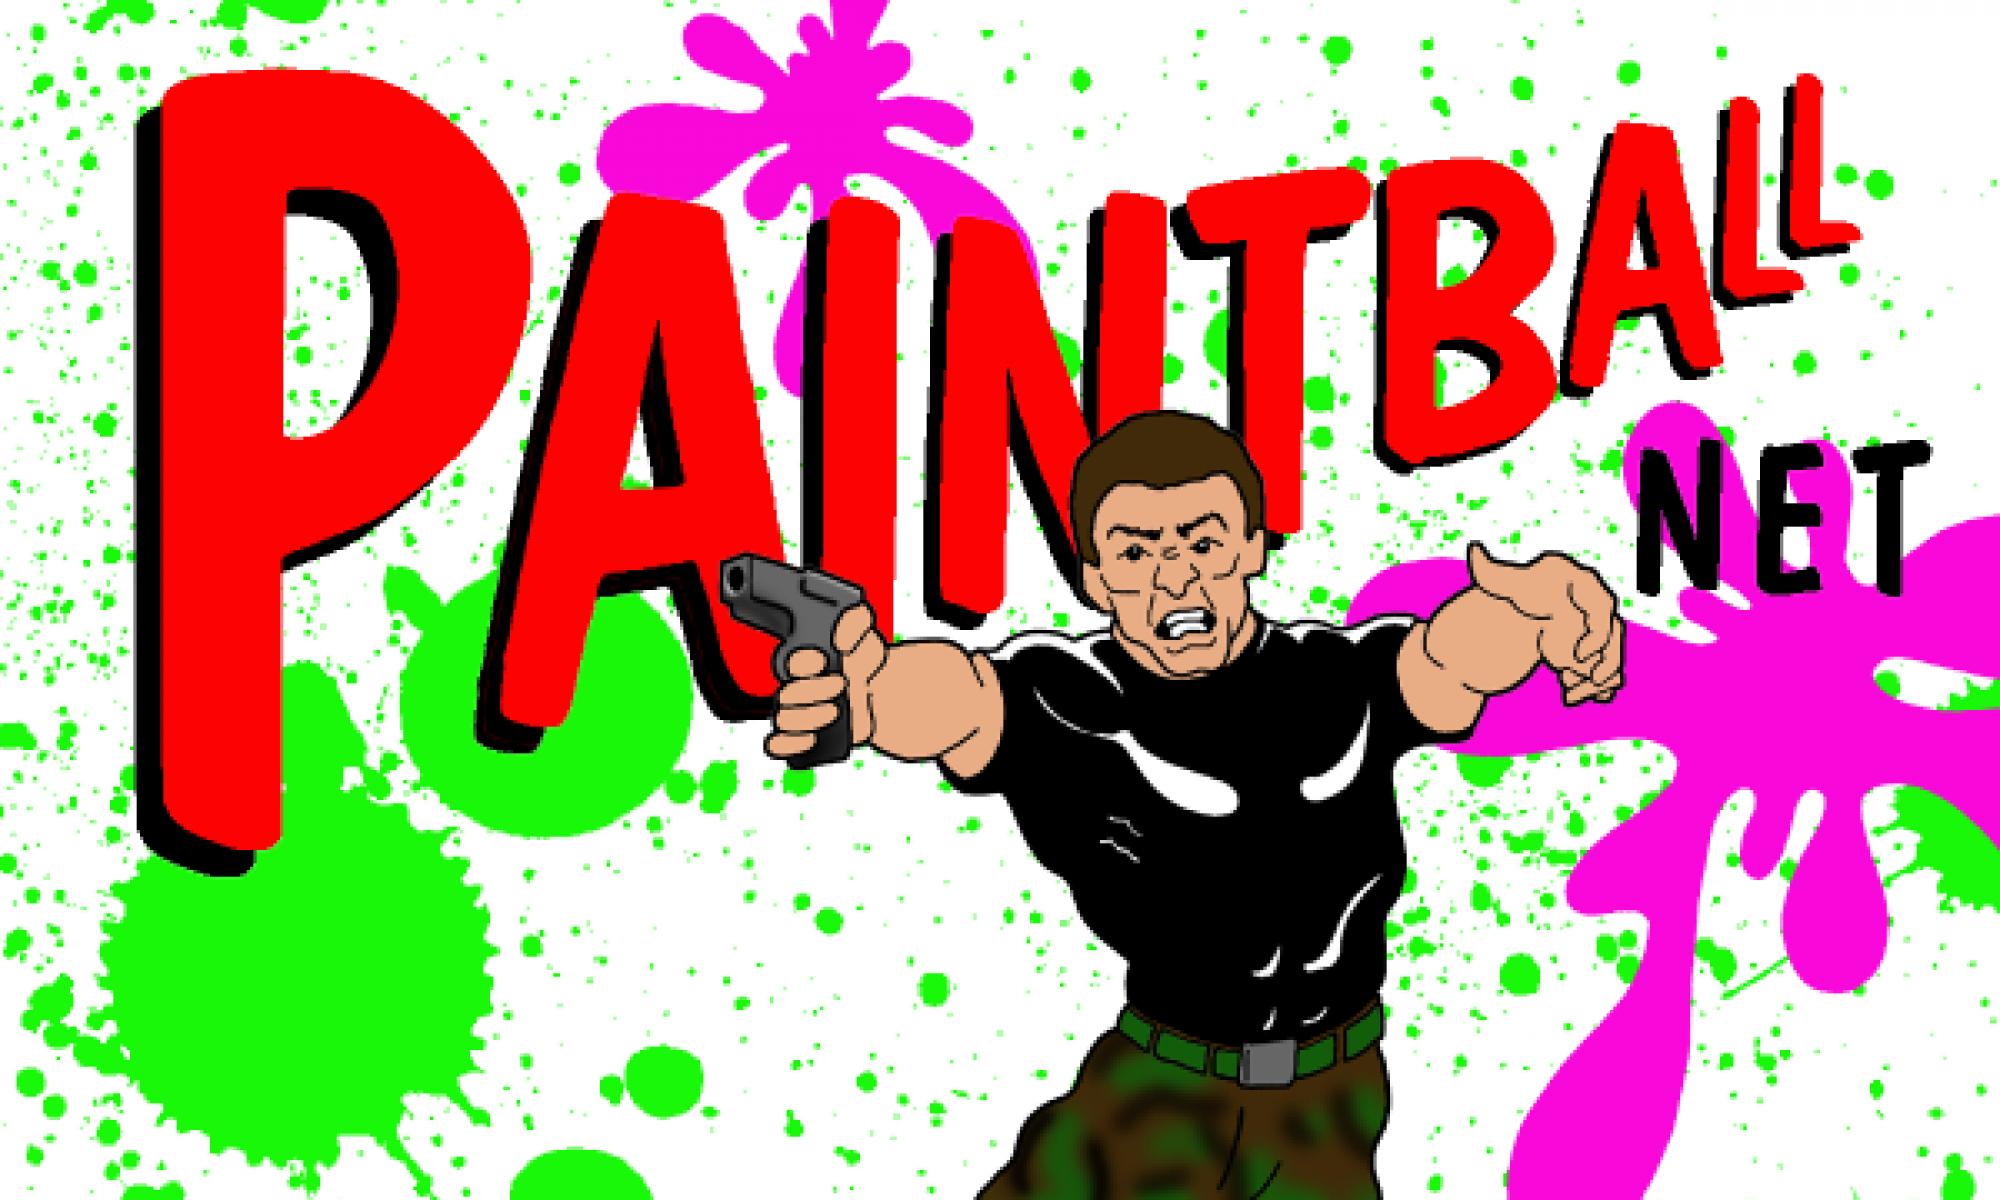 Paintball Net